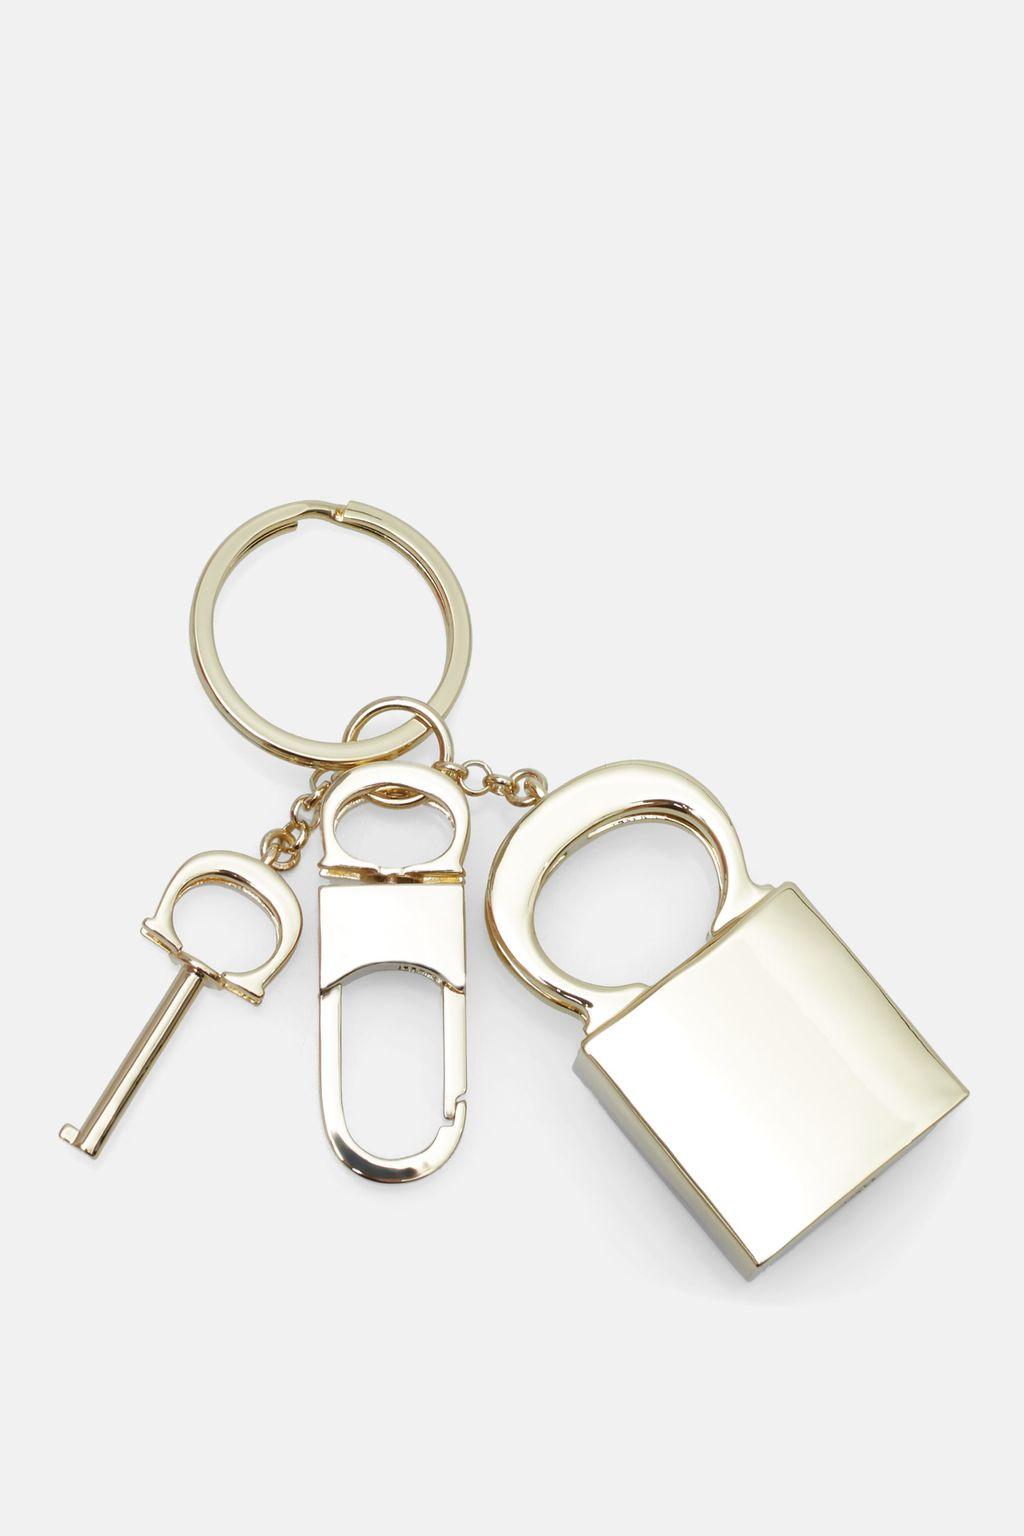 Locked Insignia keychain